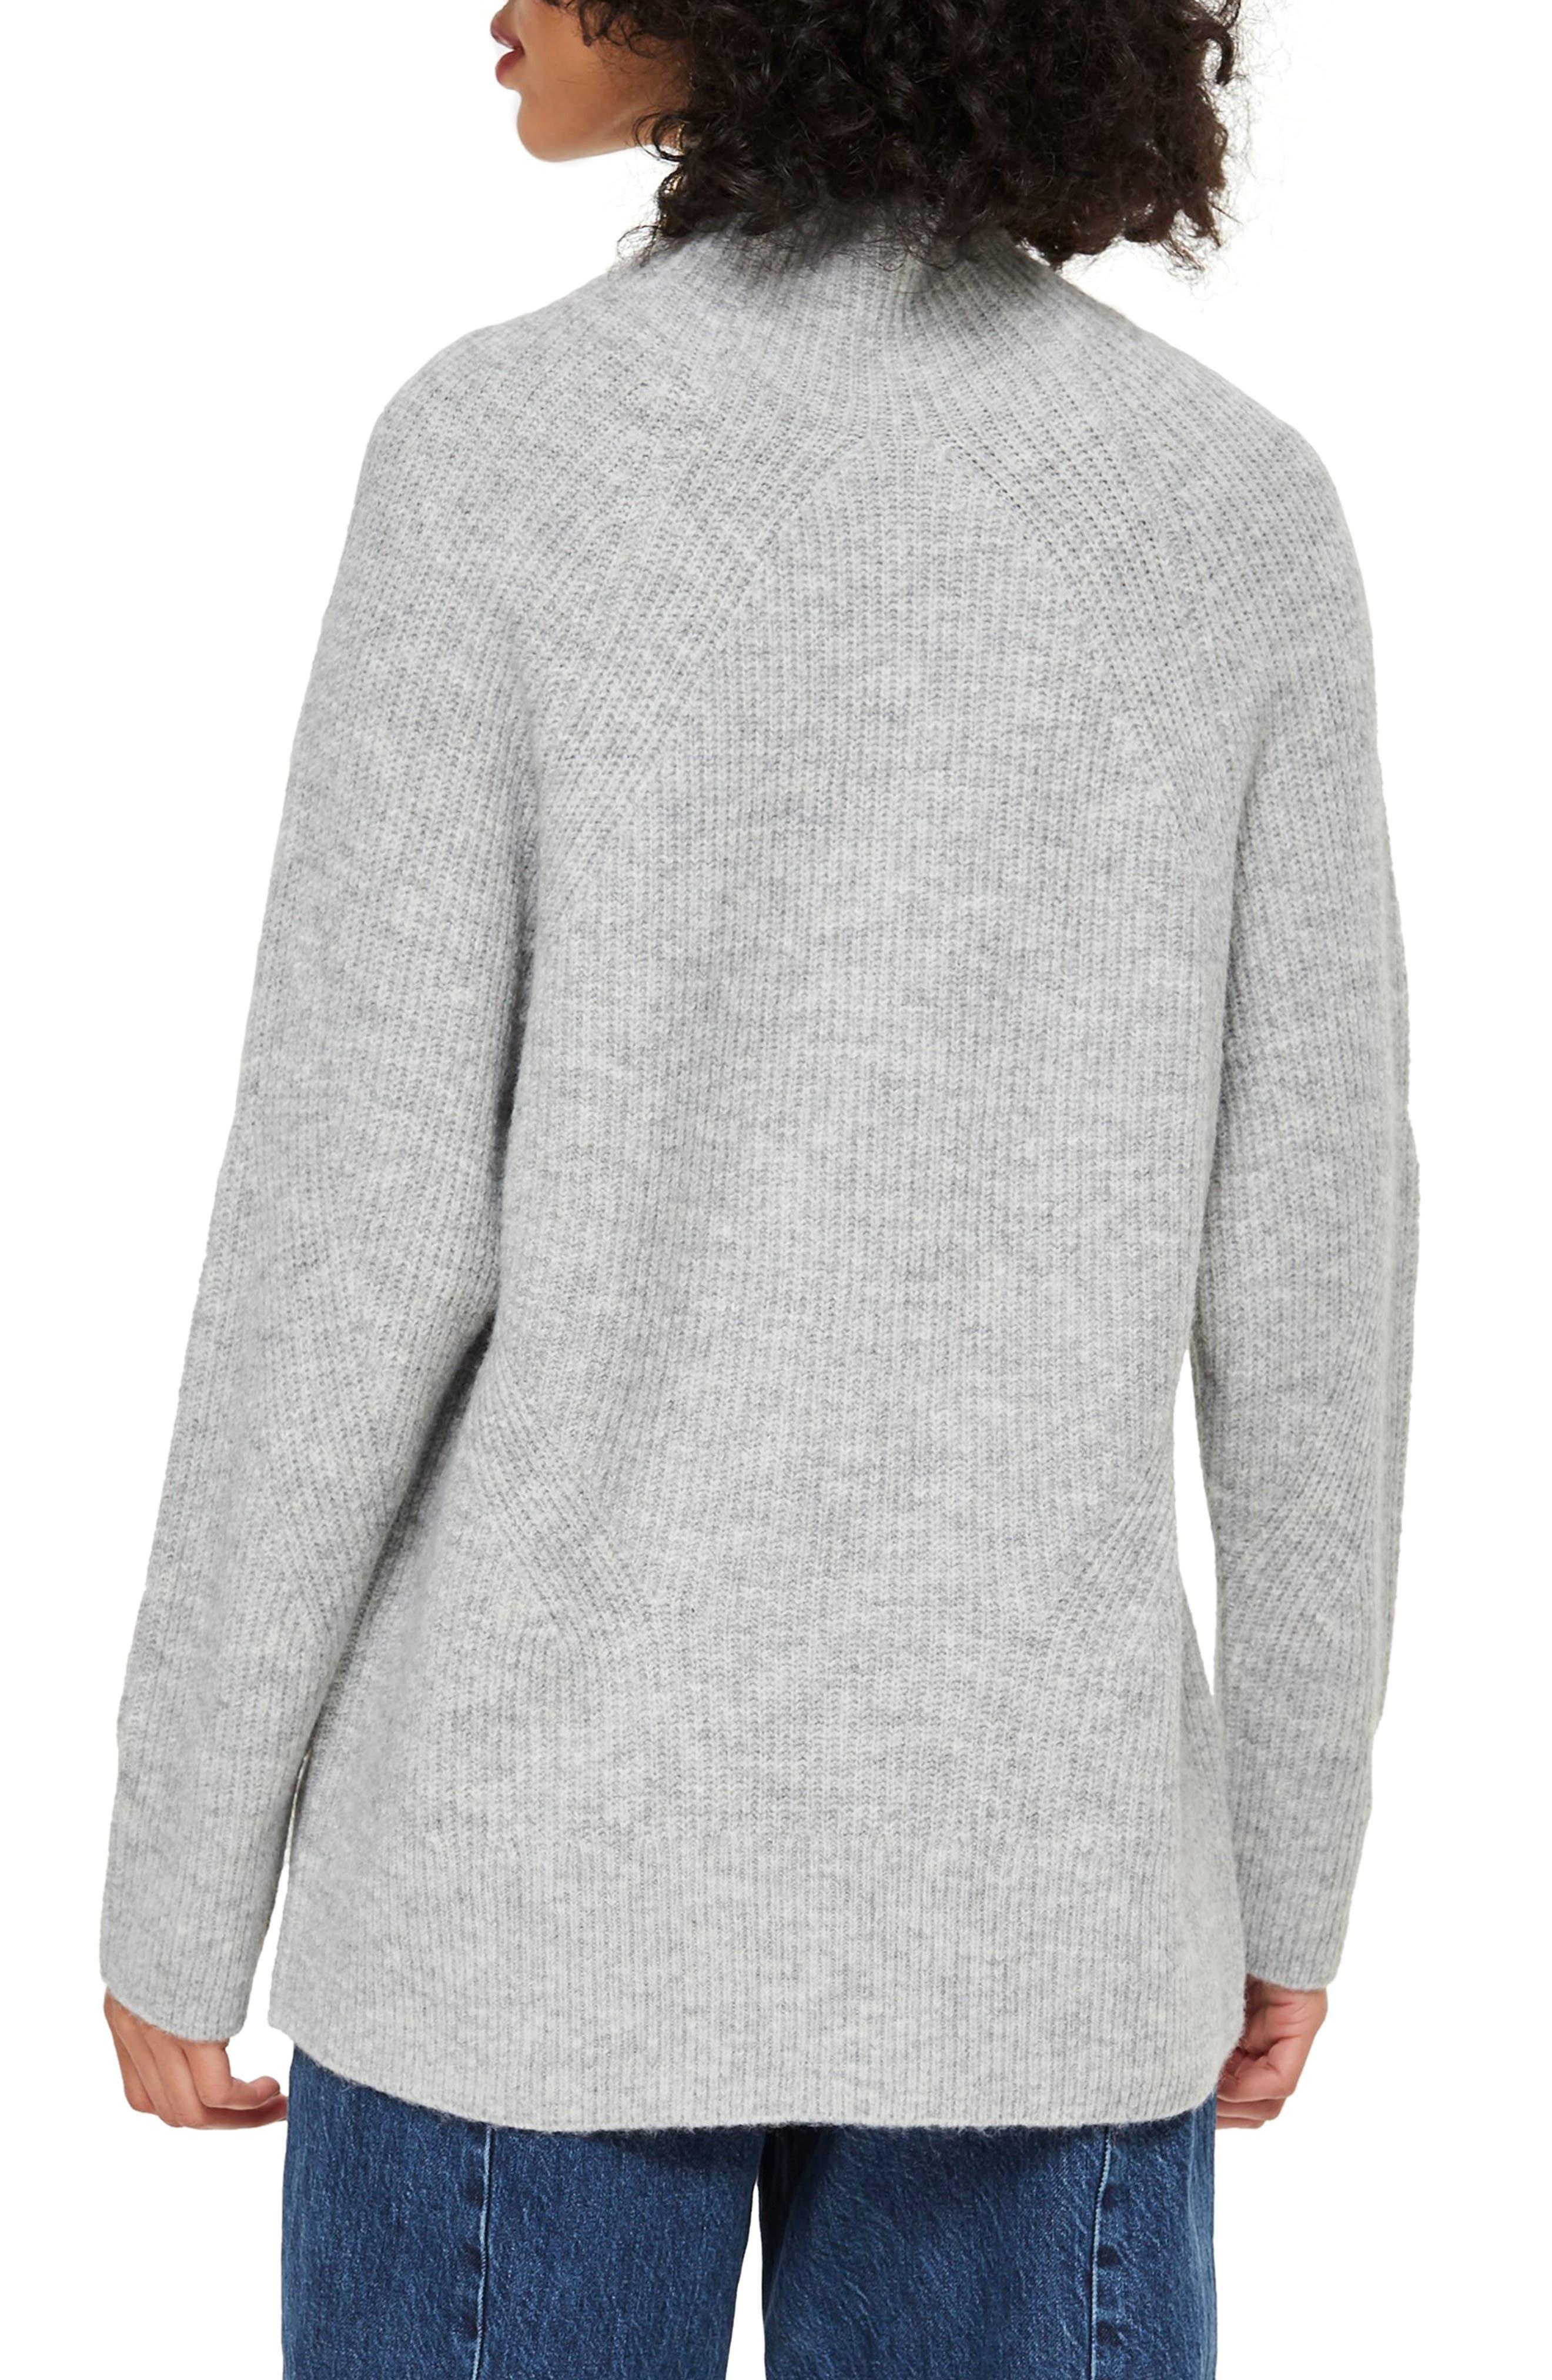 TOPSHOP, Raglan Turtleneck Neck Sweater, Alternate thumbnail 2, color, GREY MARL